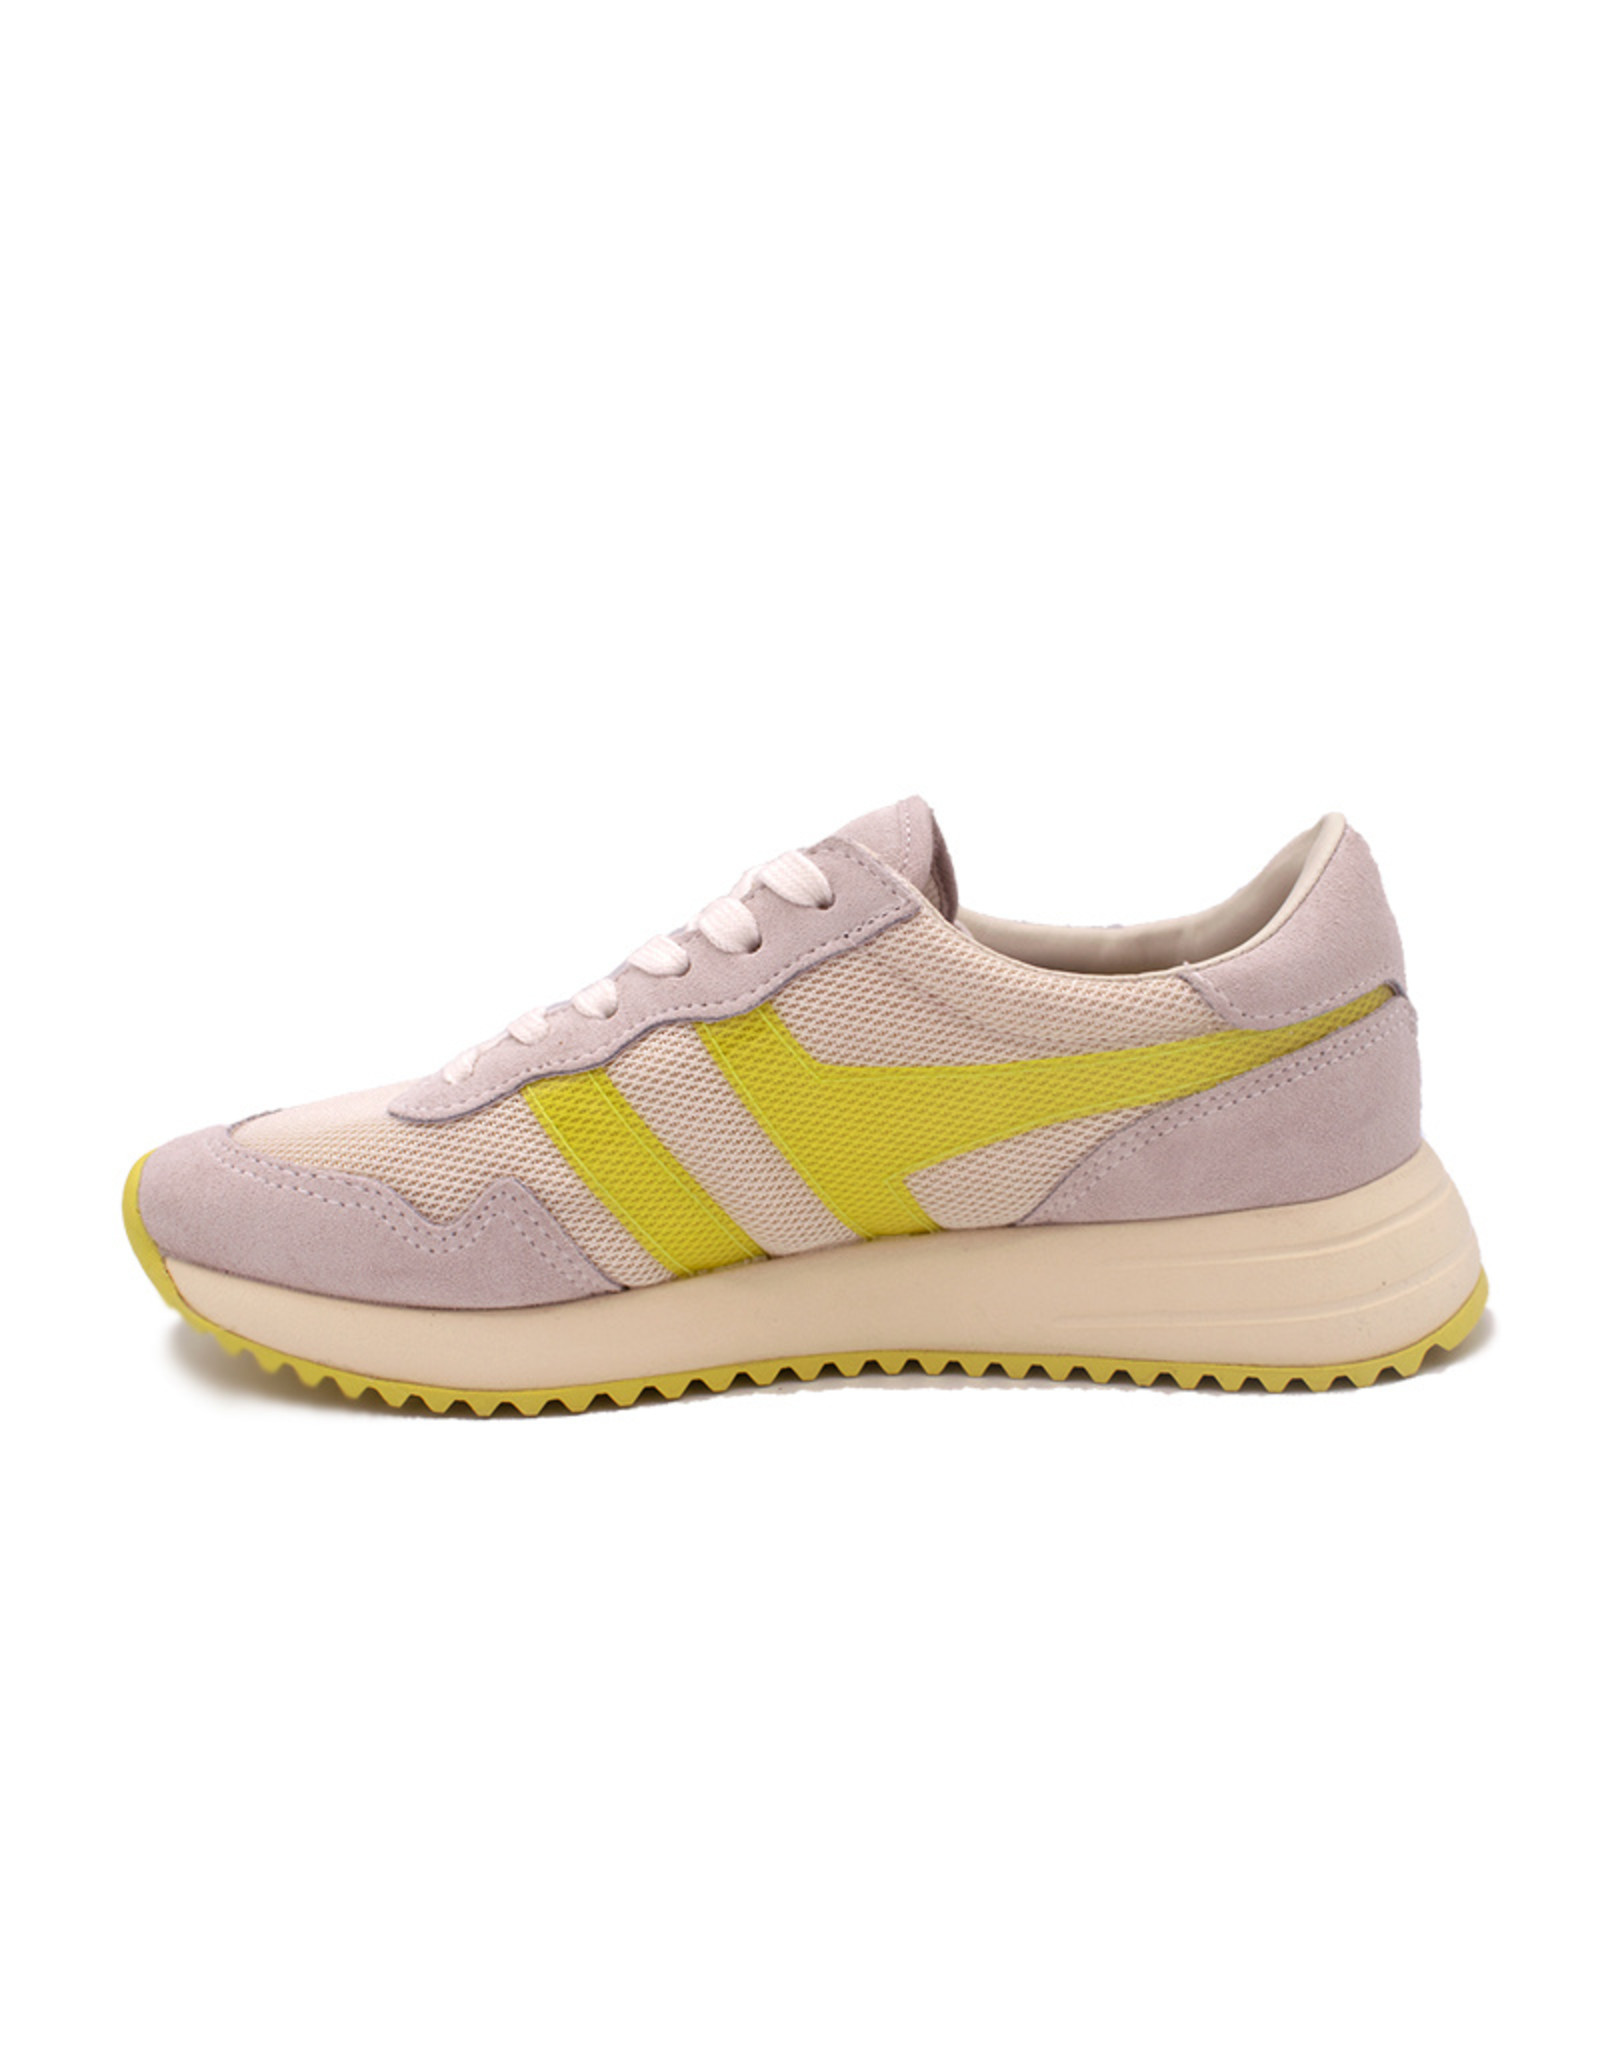 GOLA GOLA sneaker vancouver mesh off white citron